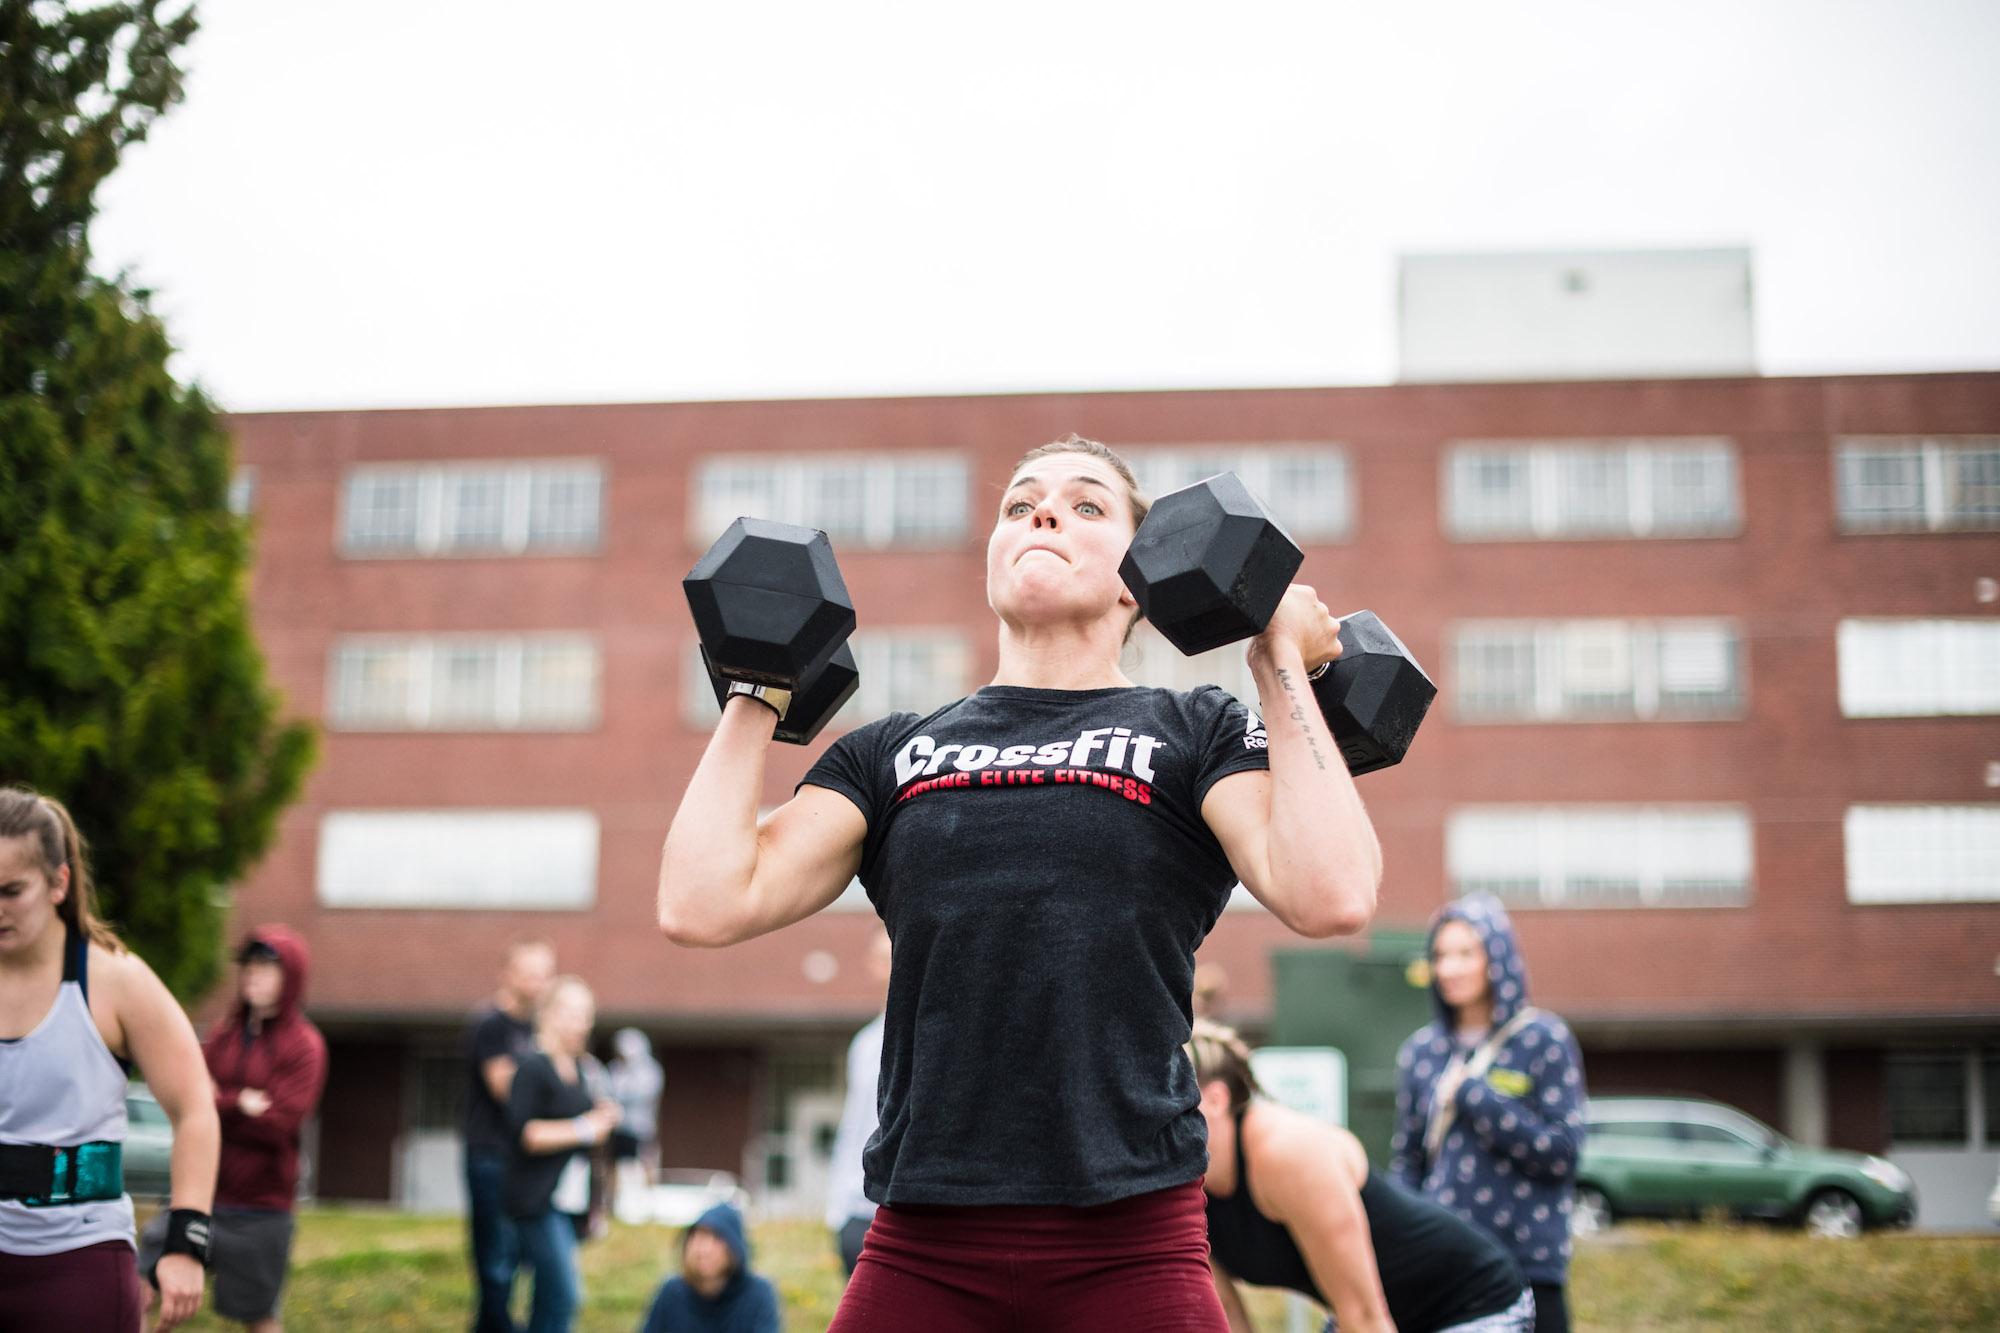 CrossFit: Forging Elite Fitness: Saturday 181013